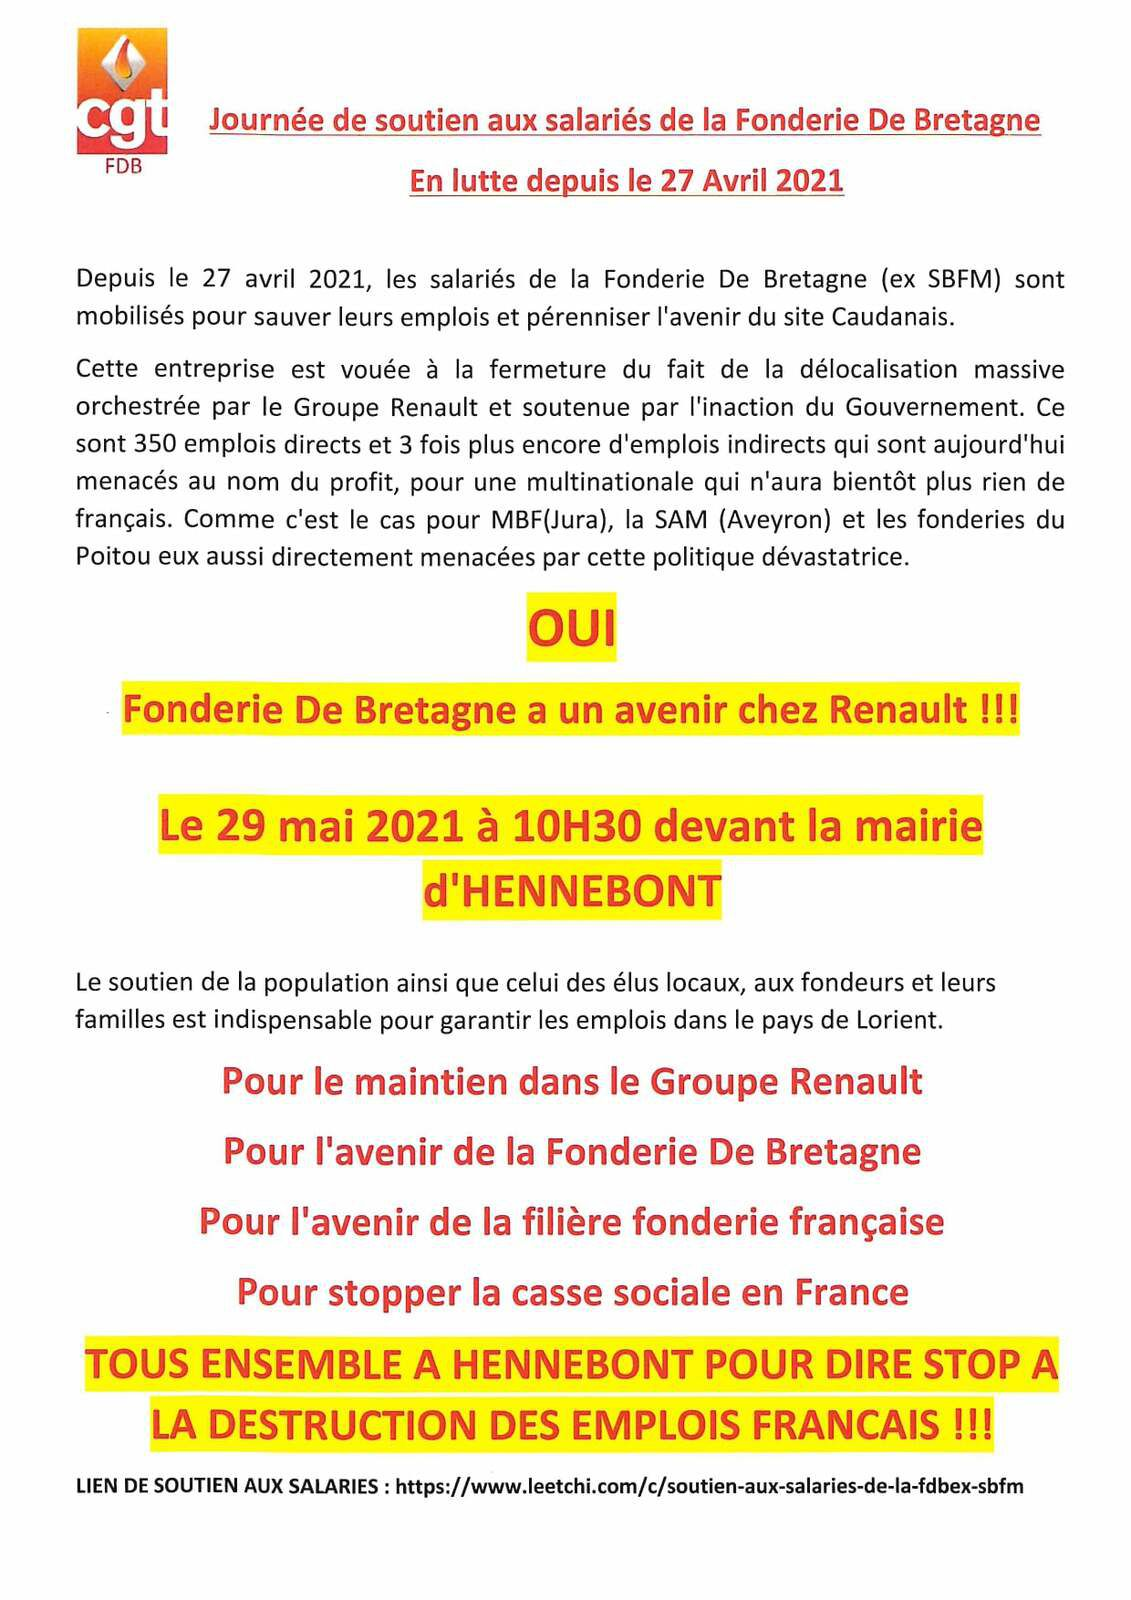 Fonderie de Bretagne: 2000 manifestants dans les rues d'Hennebont ce samedi 29 mai